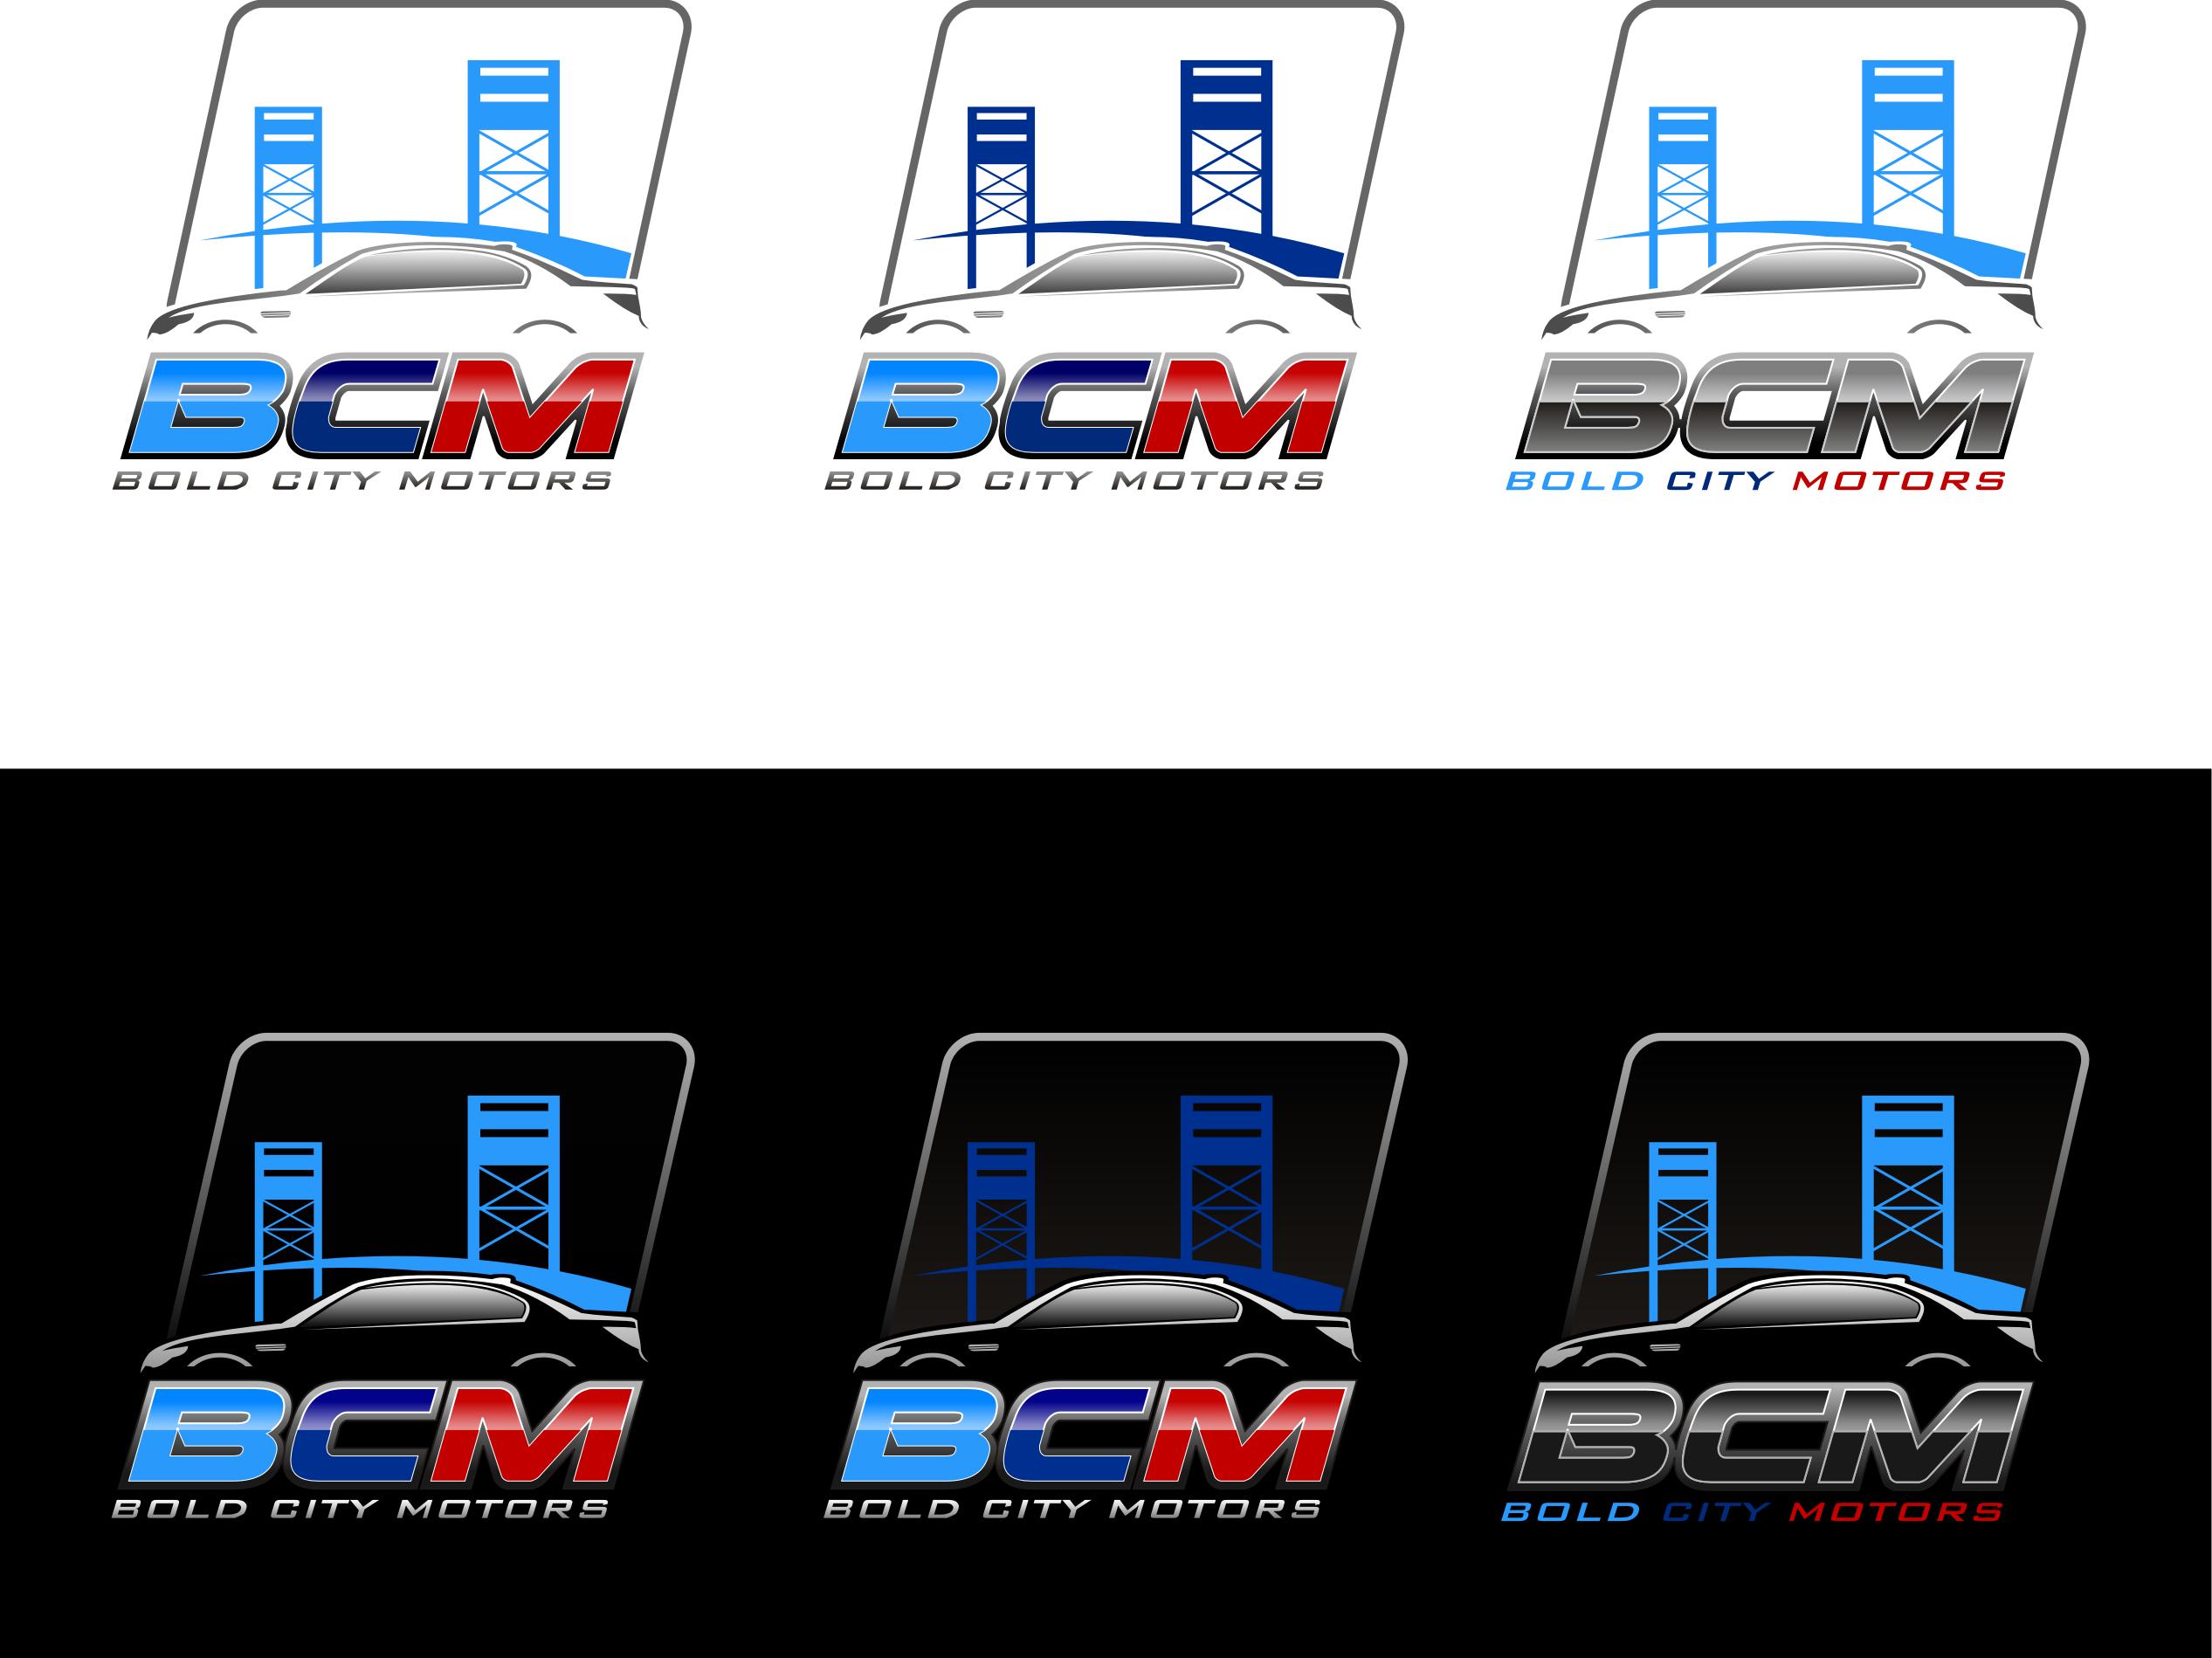 Bold City Motors needs a powerful & luxurious new logo